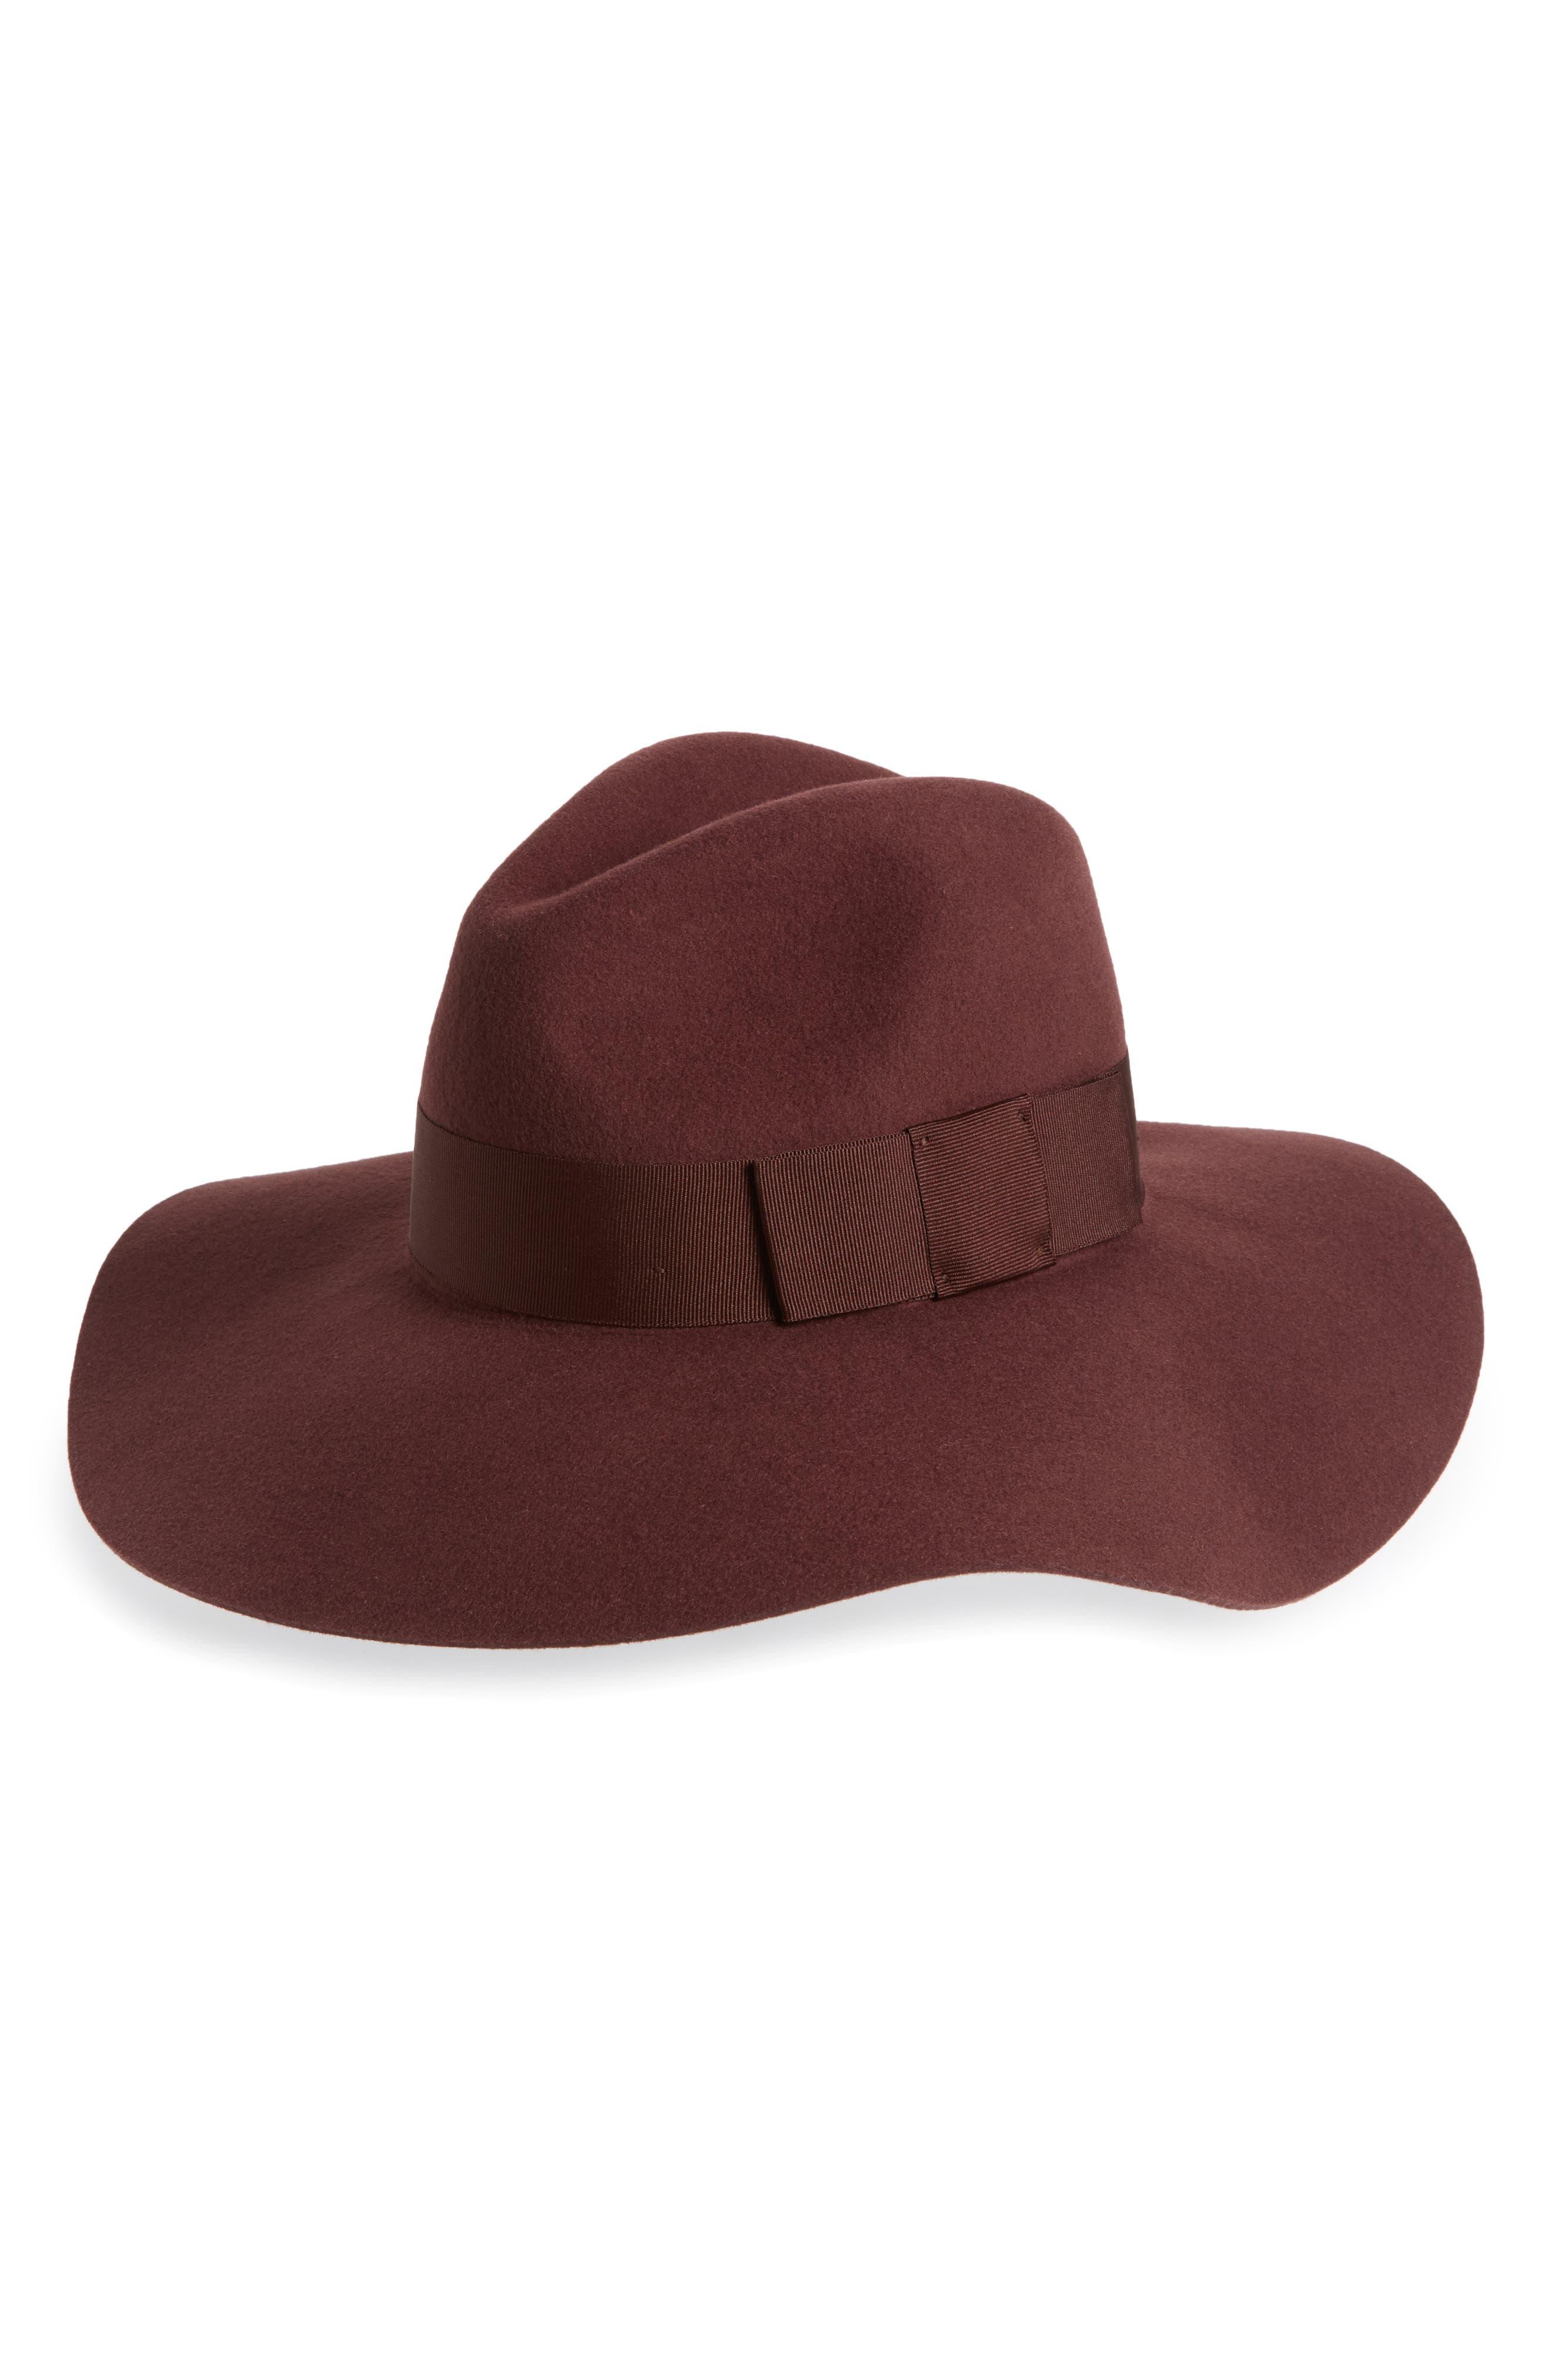 Alternate Image 1 Selected - Brixton Piper Floppy Wool Felt Hat